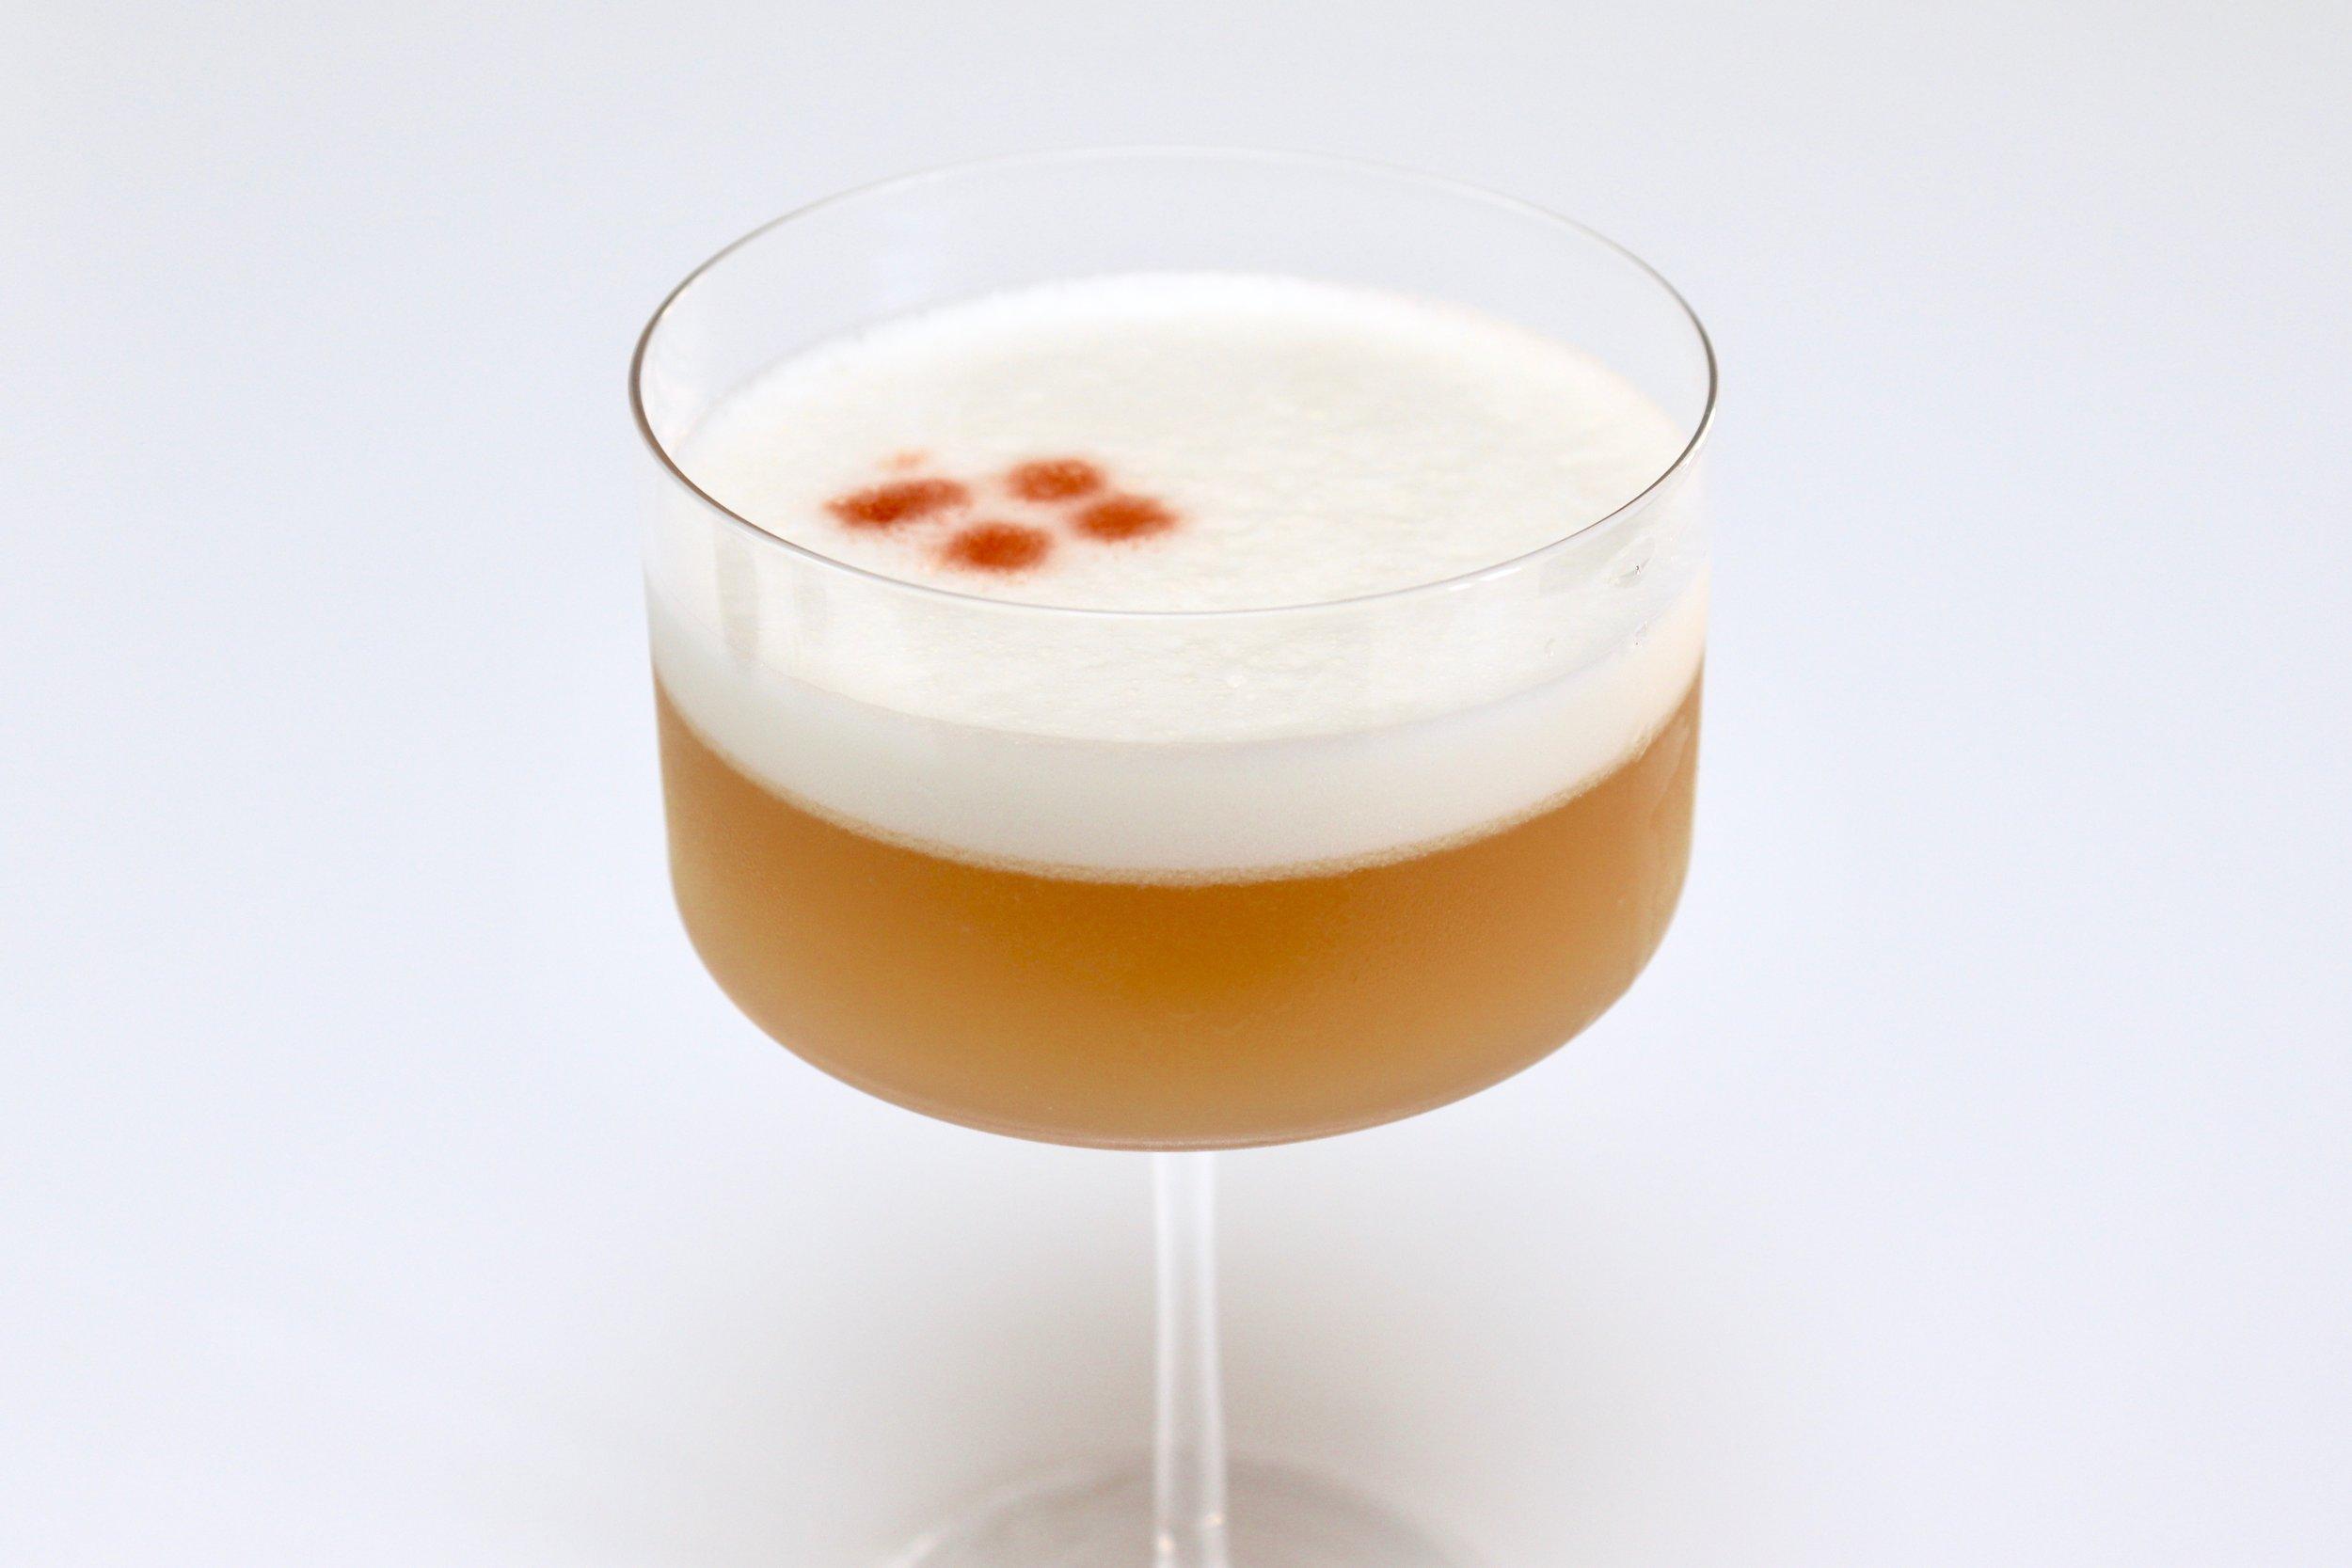 Classic Pisco Sour cocktail